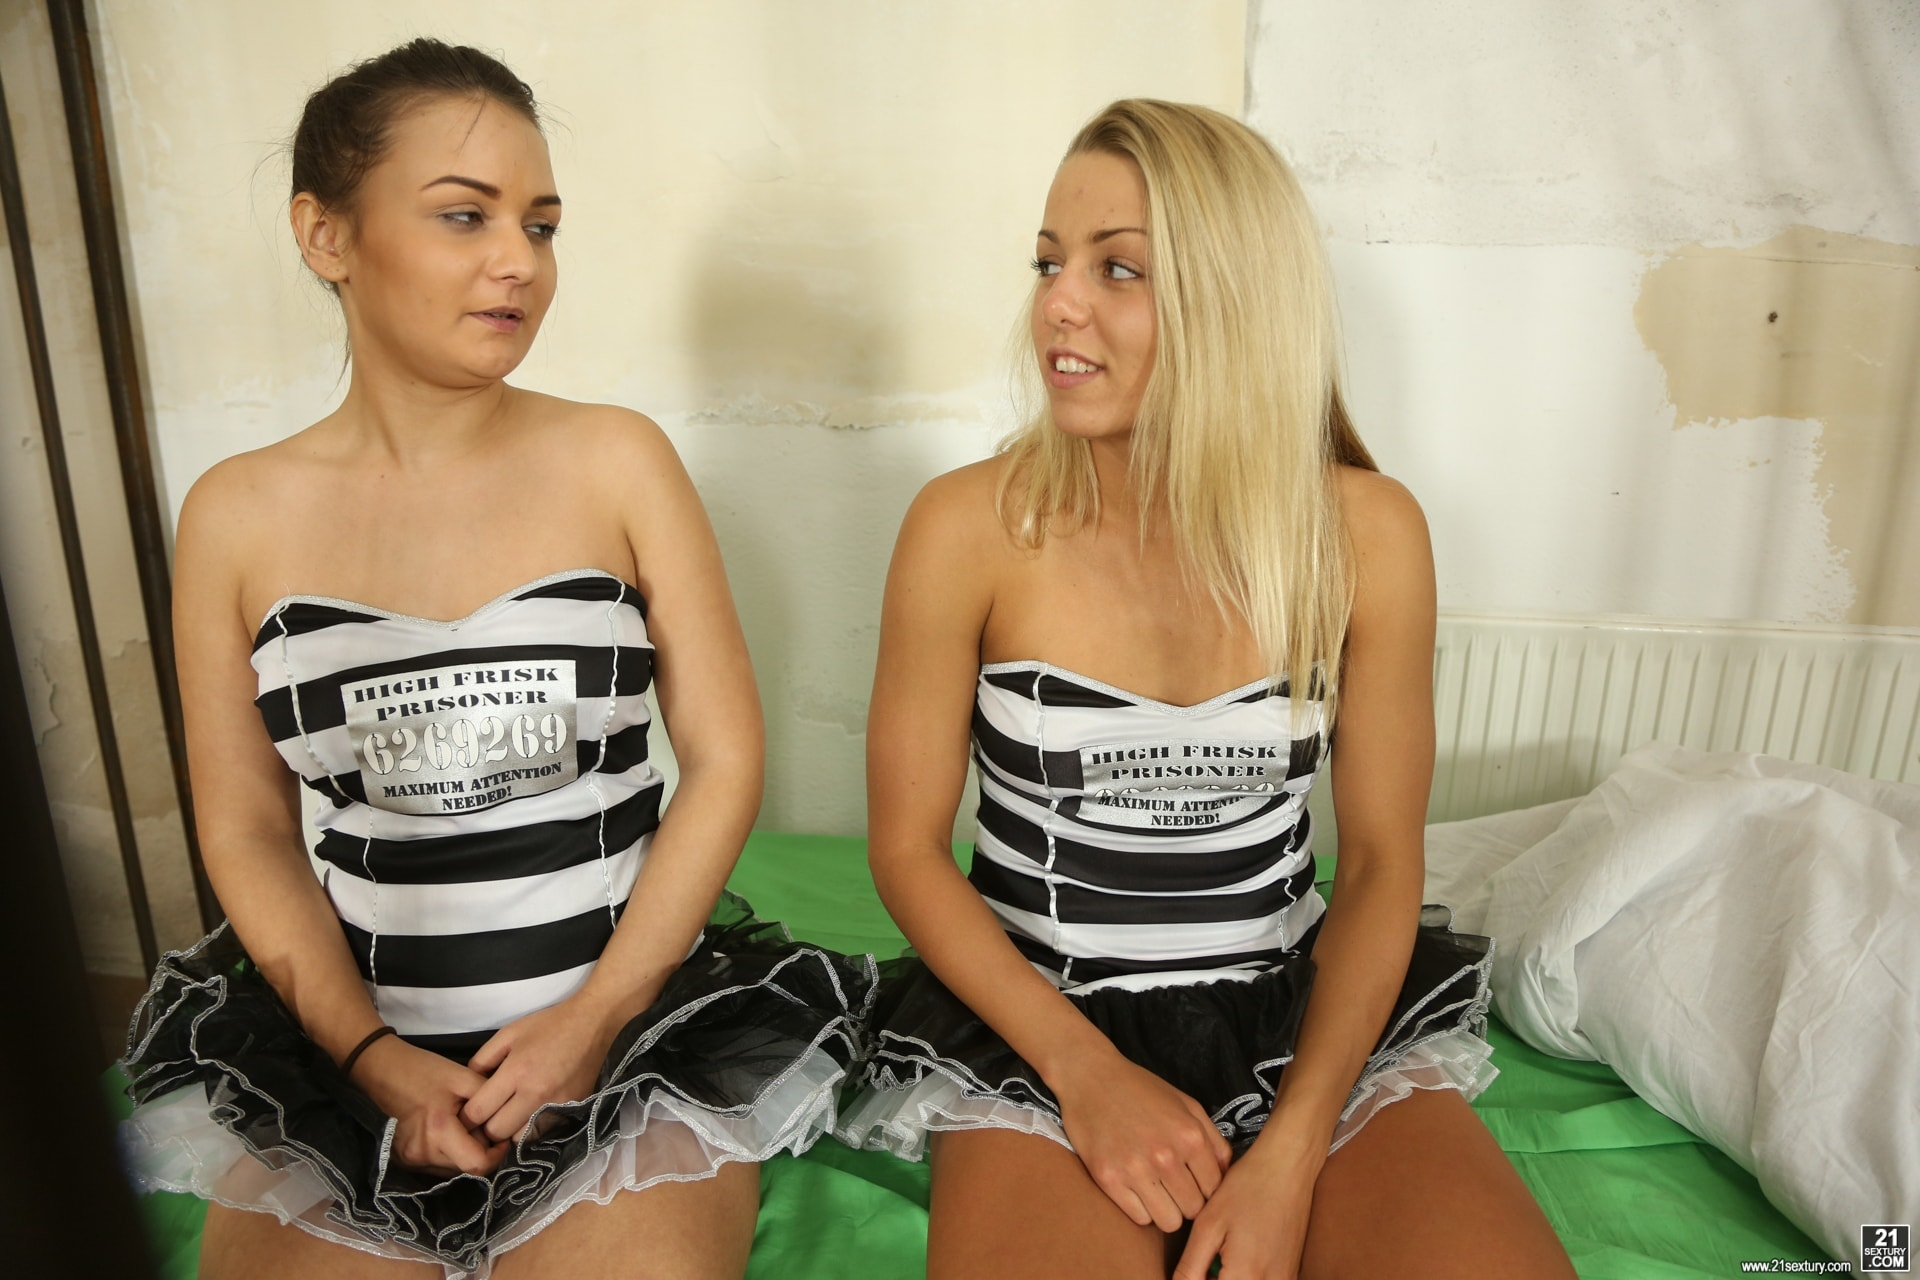 21Sextury 'High Frisk Prisoners' starring Christen Courtney (Photo 1)